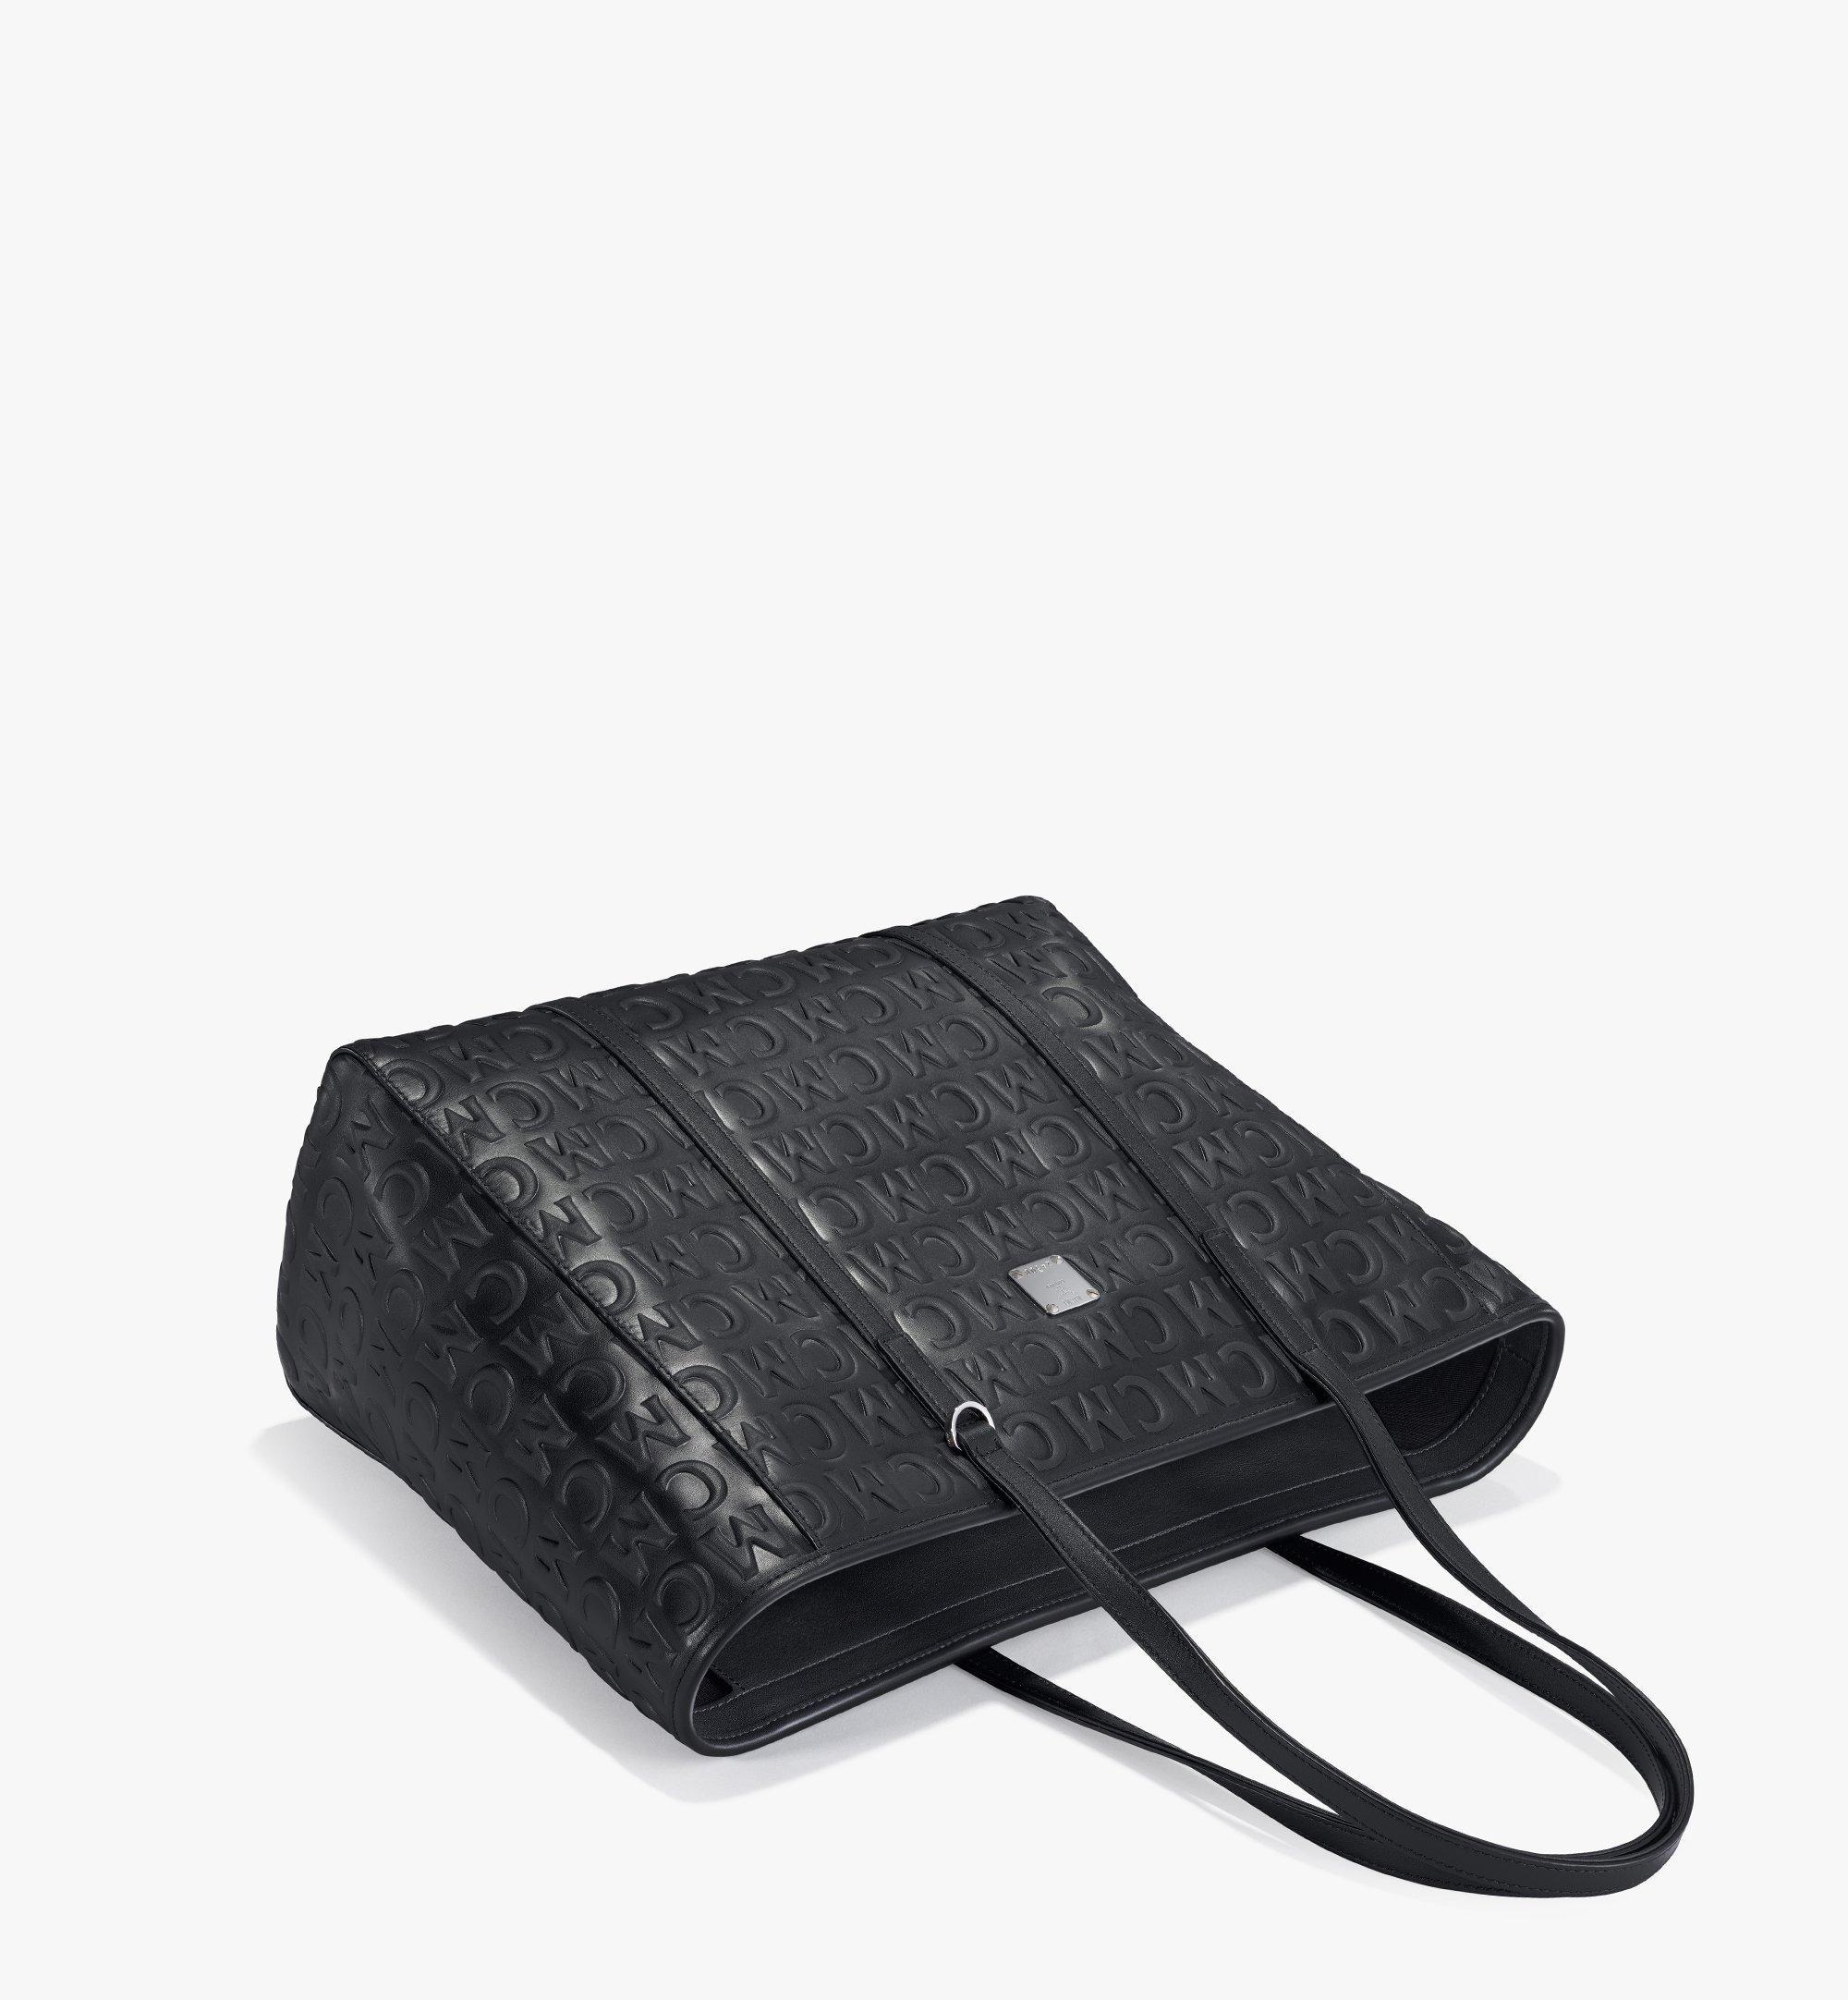 MCM Toni Shopper aus Leder mit MCM-Monogramm Black MWPAATN06BK001 Noch mehr sehen 2